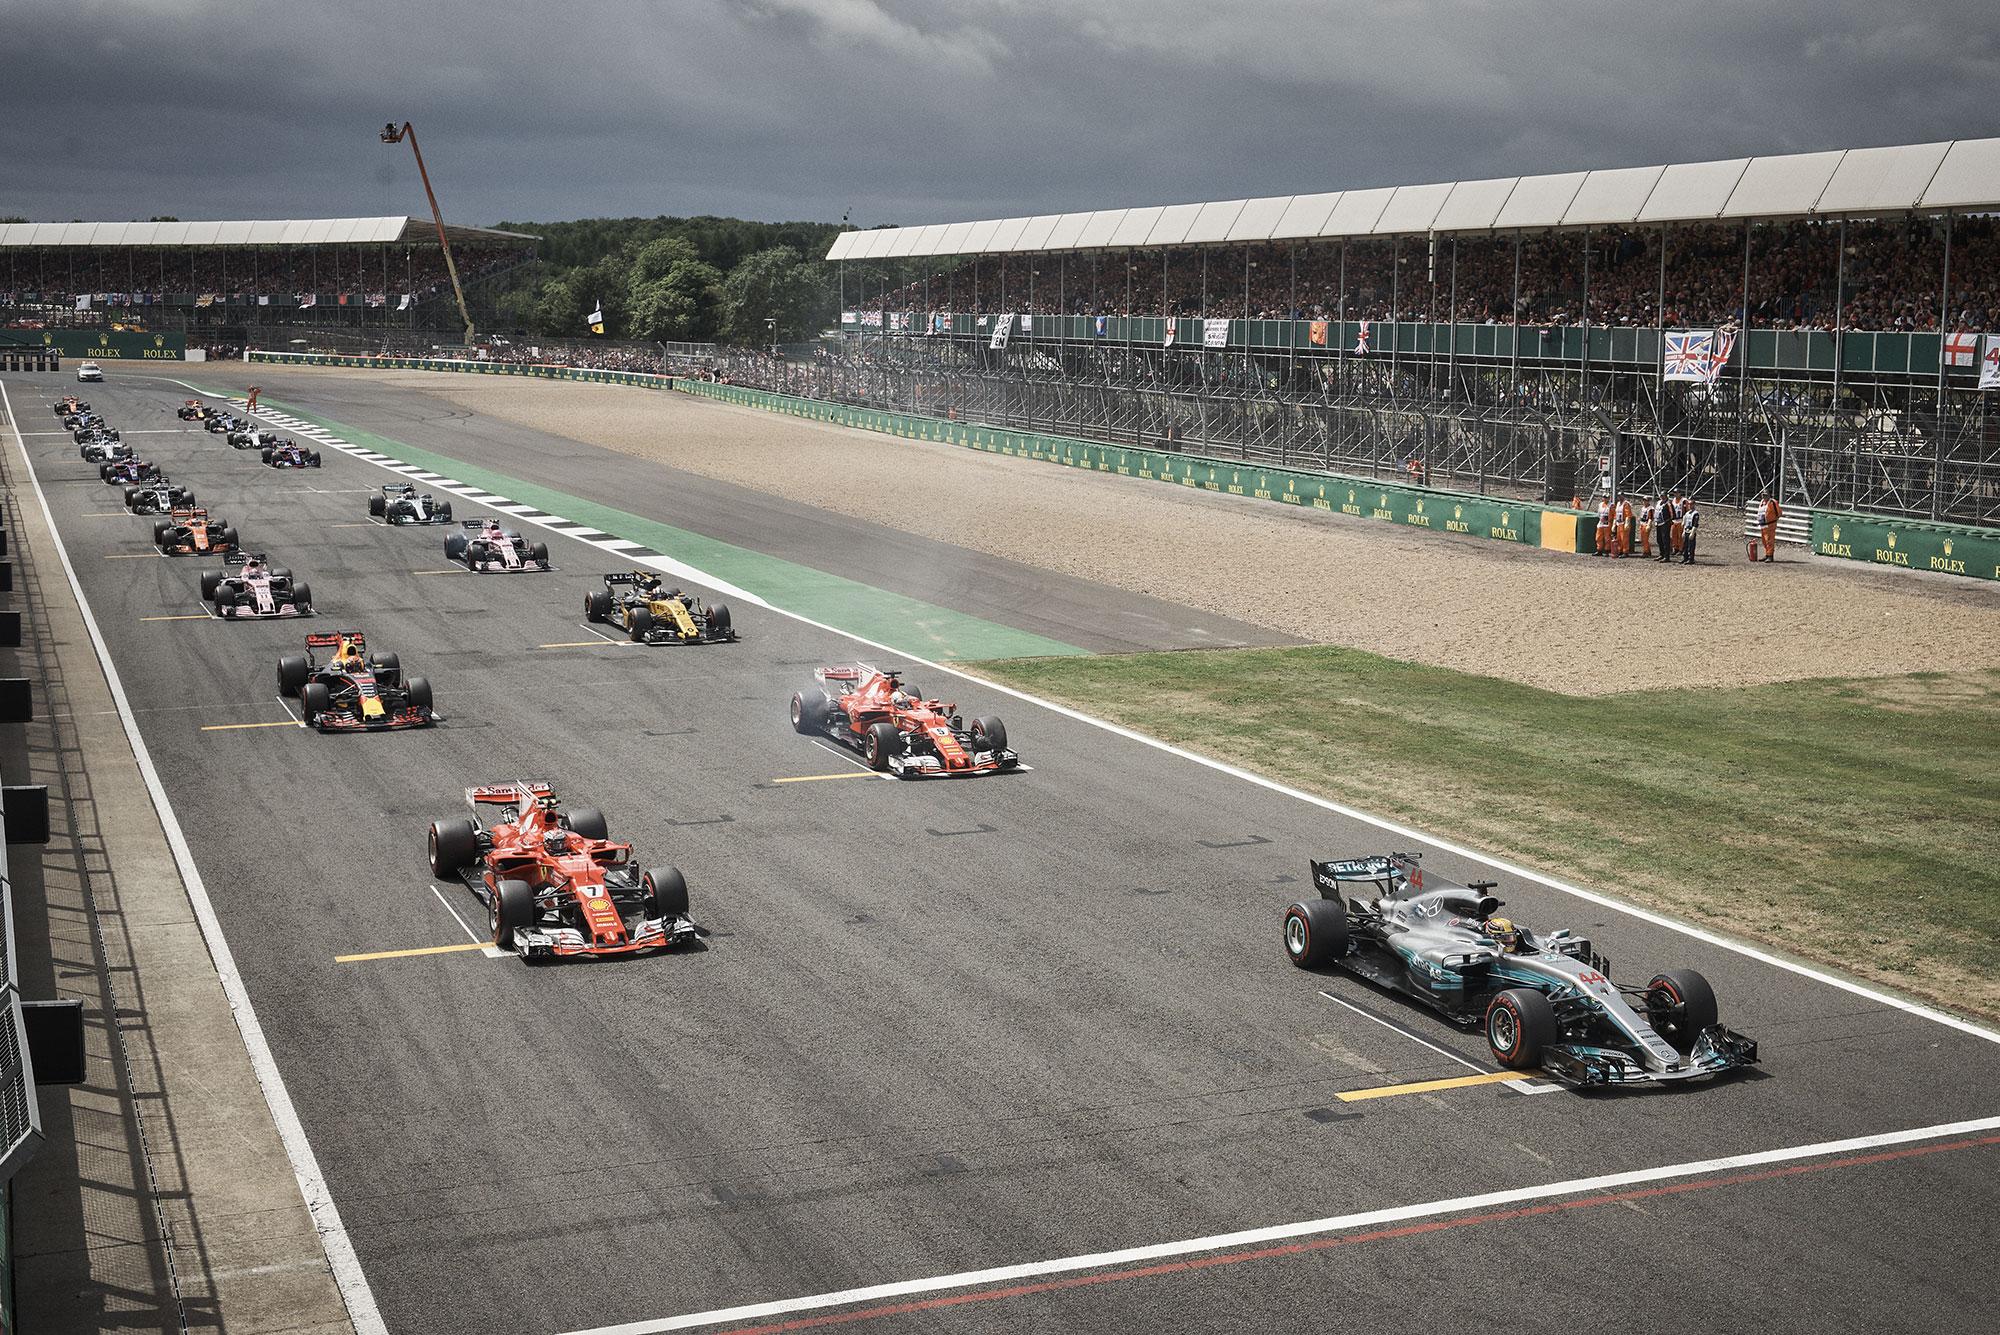 Lewis Hamilton in pole position at Silverstone Grand Prix 2017